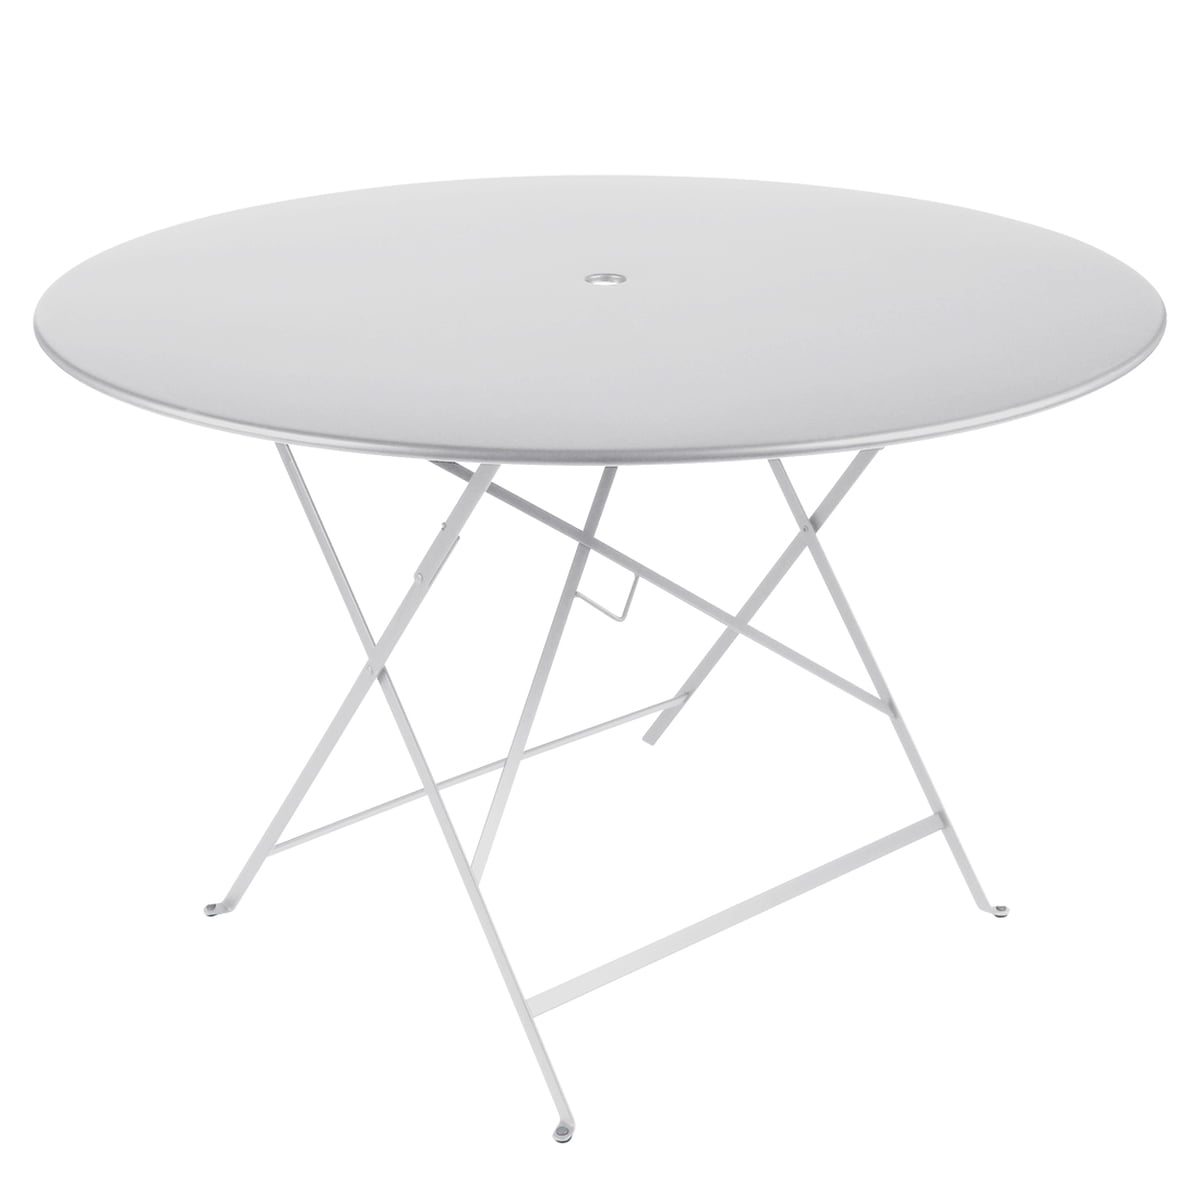 Fermob - Table pliante Bistro Ø 117 cm, blanc coton